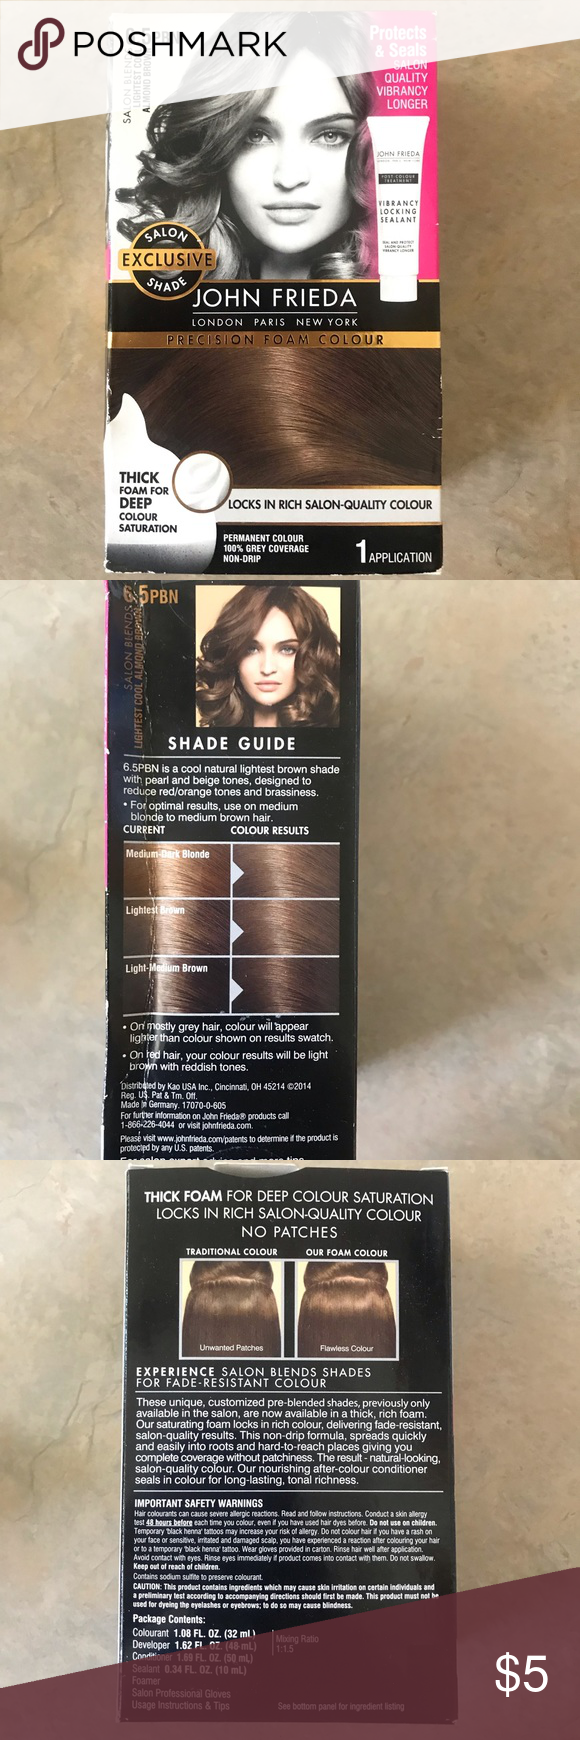 Hair Dye Unopened Box Of Lightest Cool Almond Brown Hair Dye From John Frieda Found It In My Bathroom And I Get My Hair D Brown Hair Dye Dyed Hair John